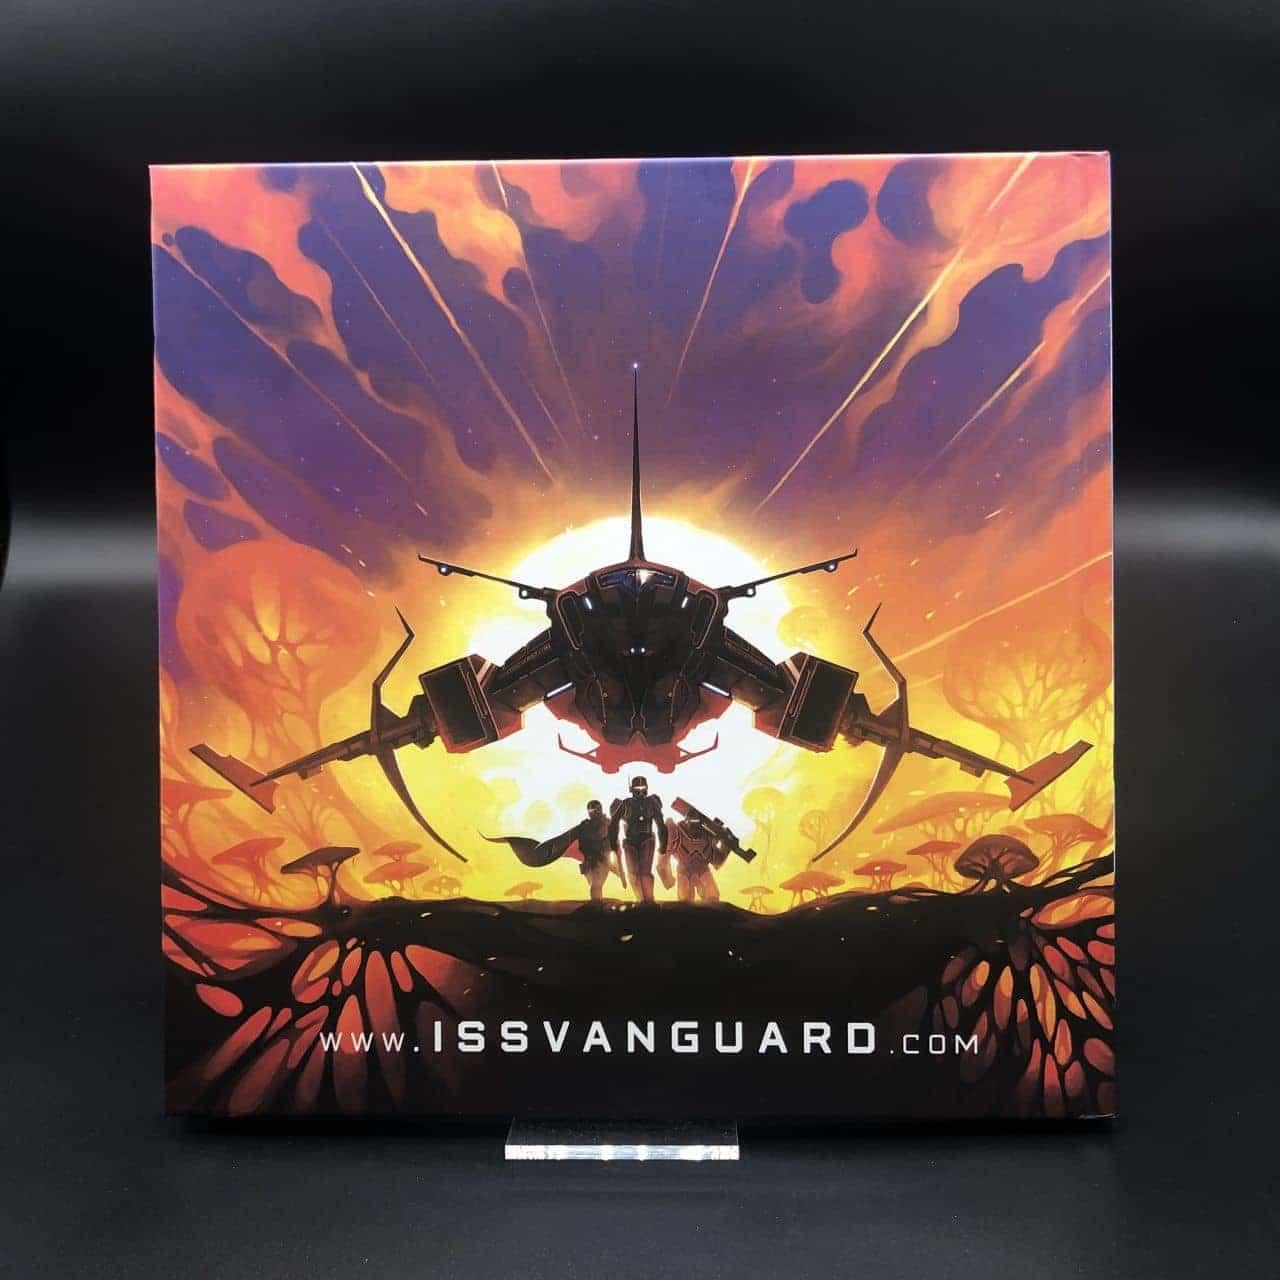 ISS Vanguard (Awaken Realms) (Sehr gut) Artbook